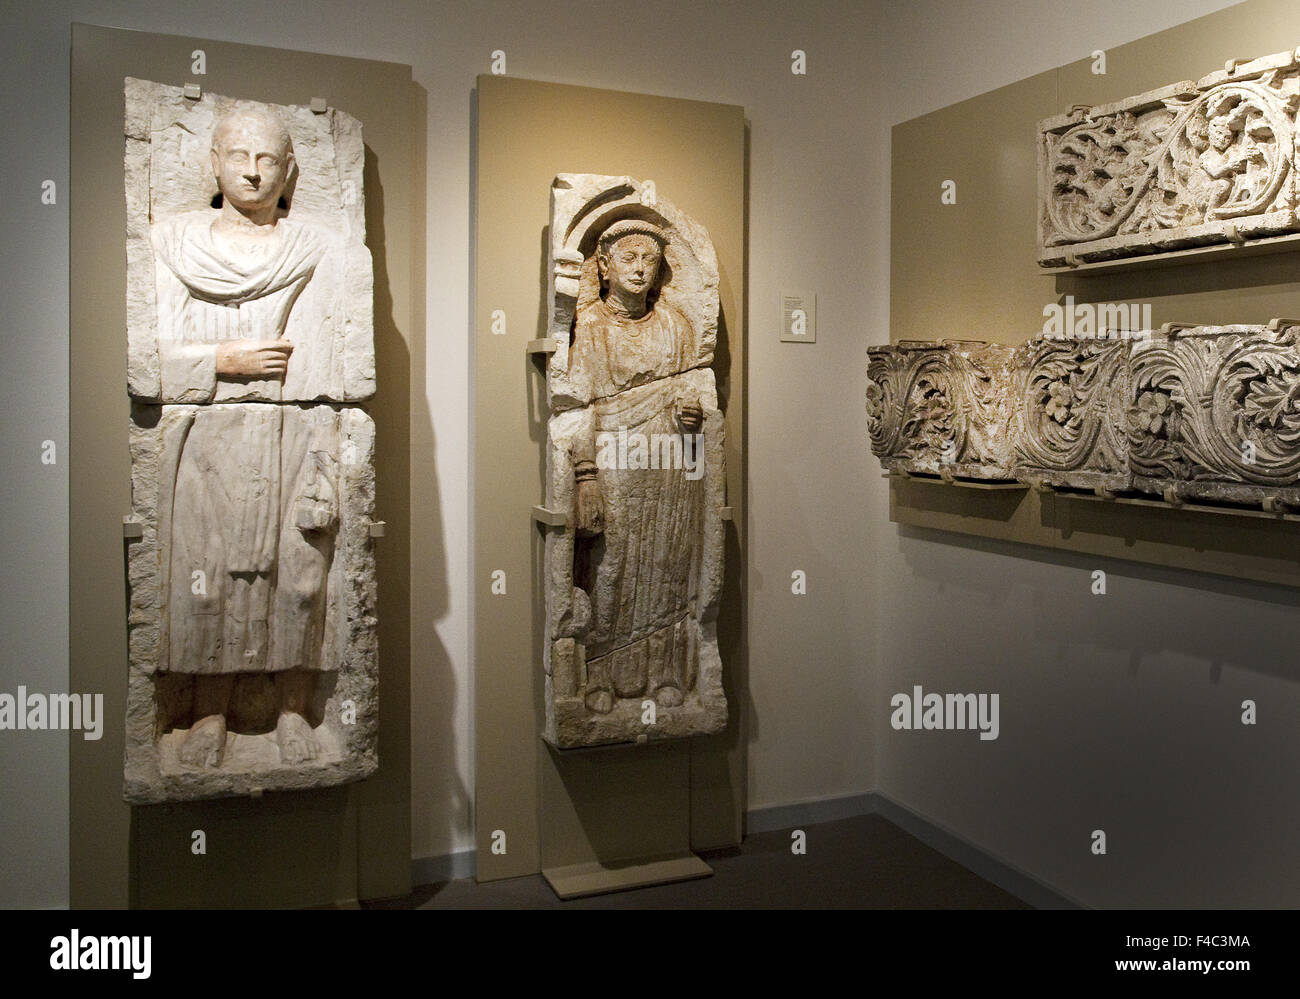 Musée des icônes, Recklinghausen, Allemagne Photo Stock